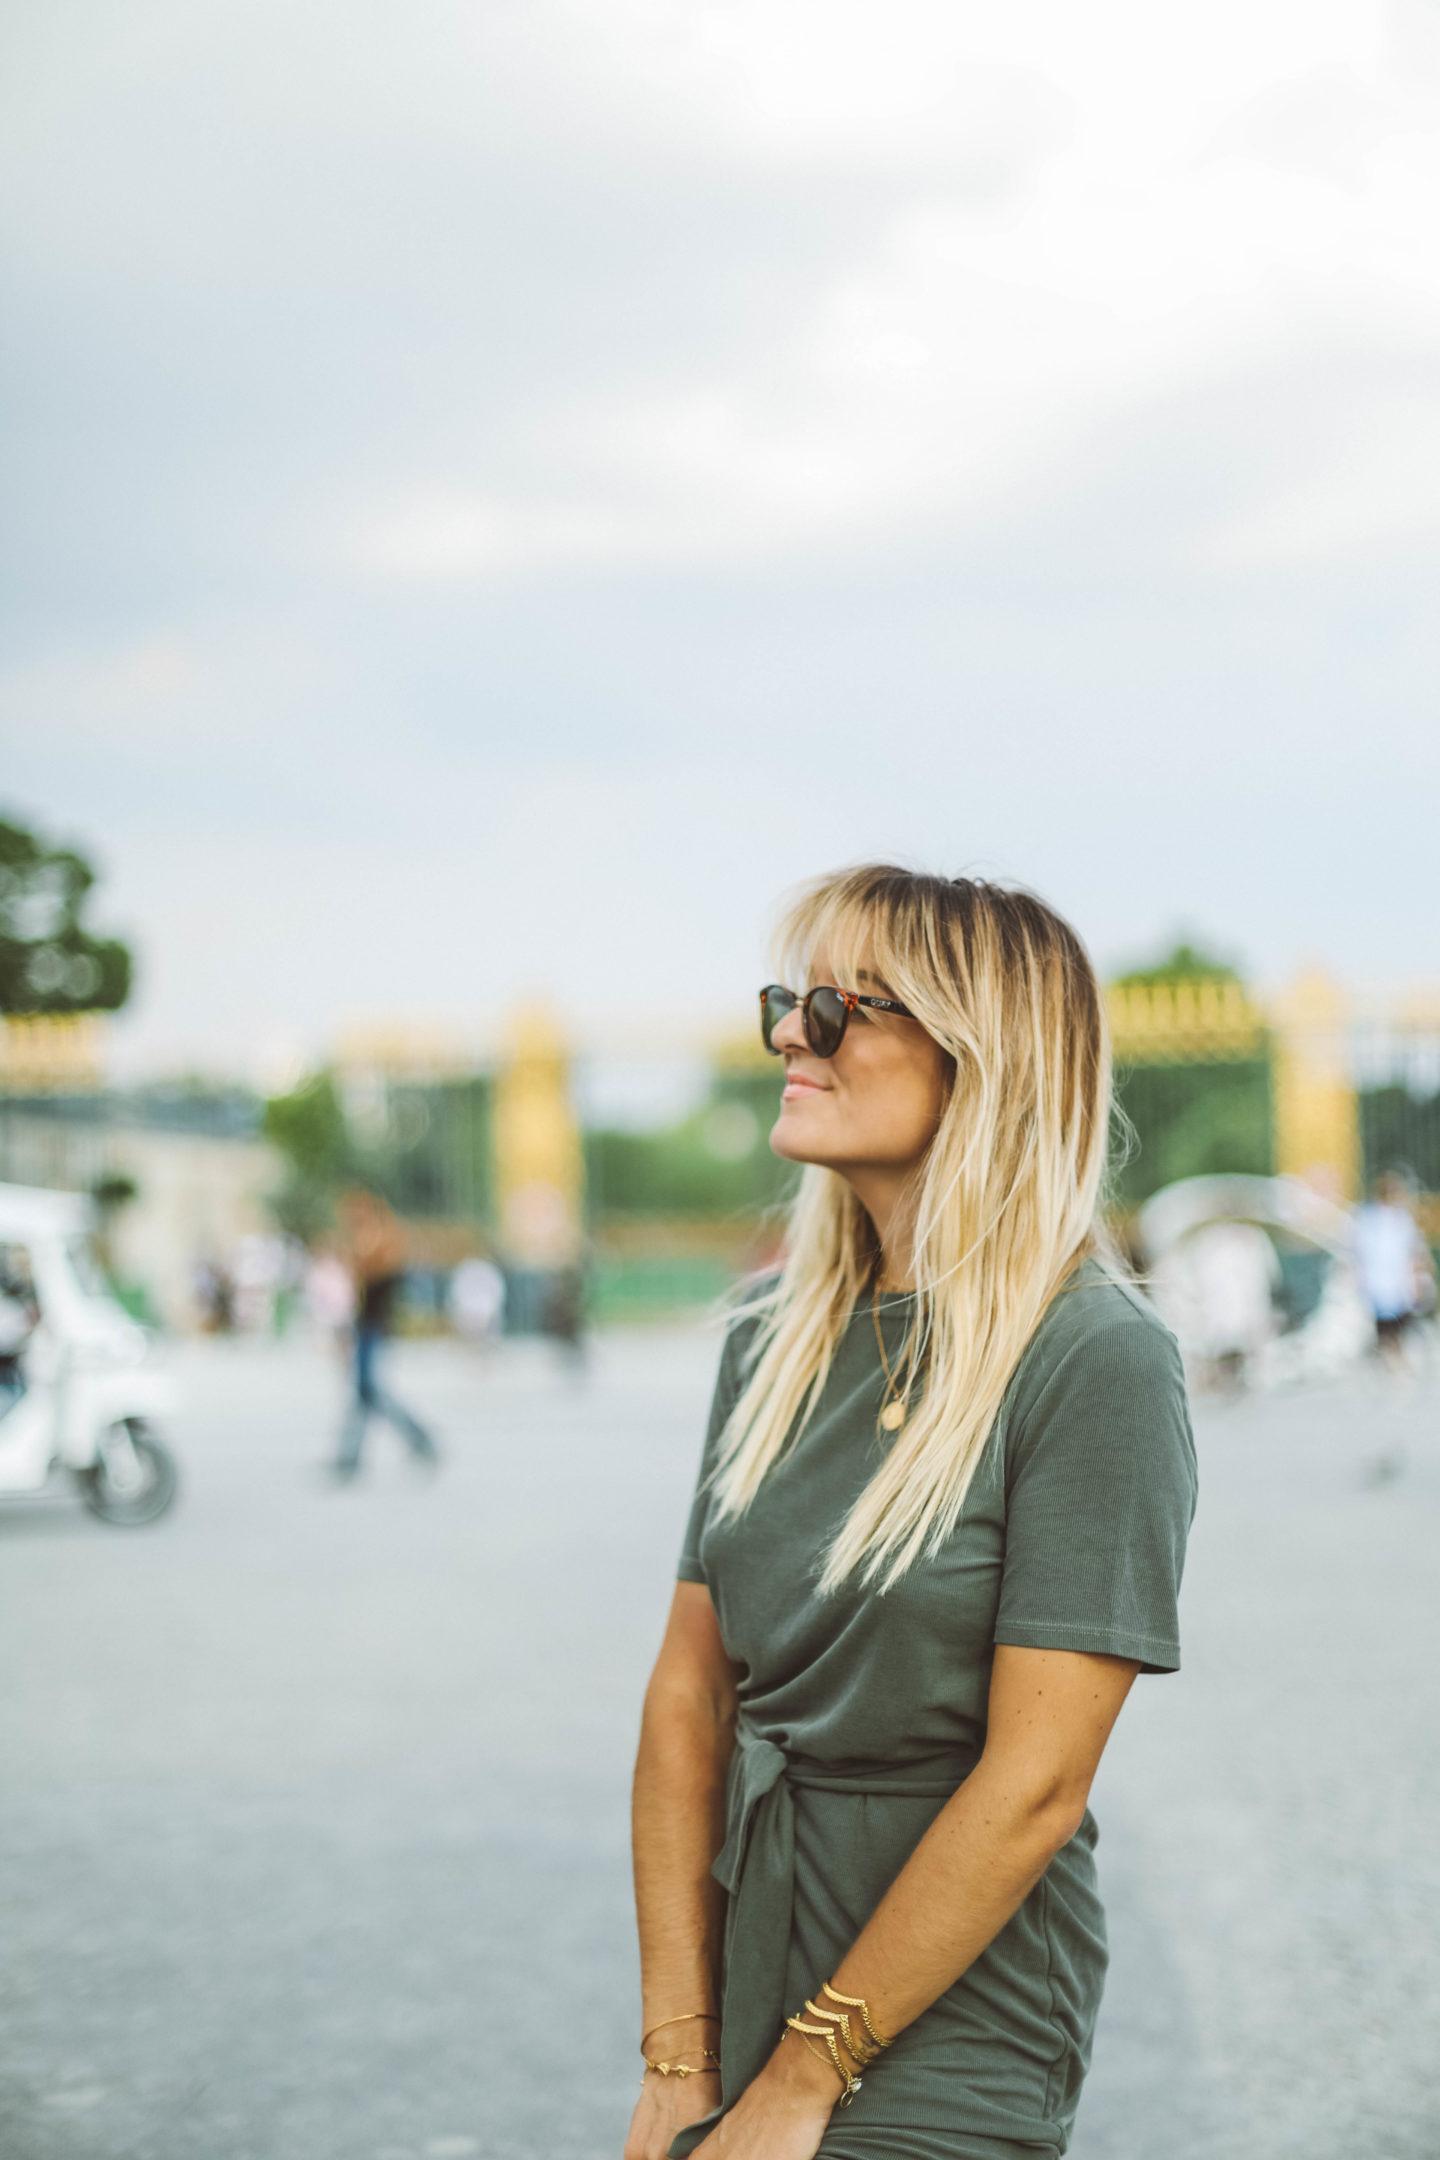 Robe Topshop - Blondie Baby blog mode Paris et voyages